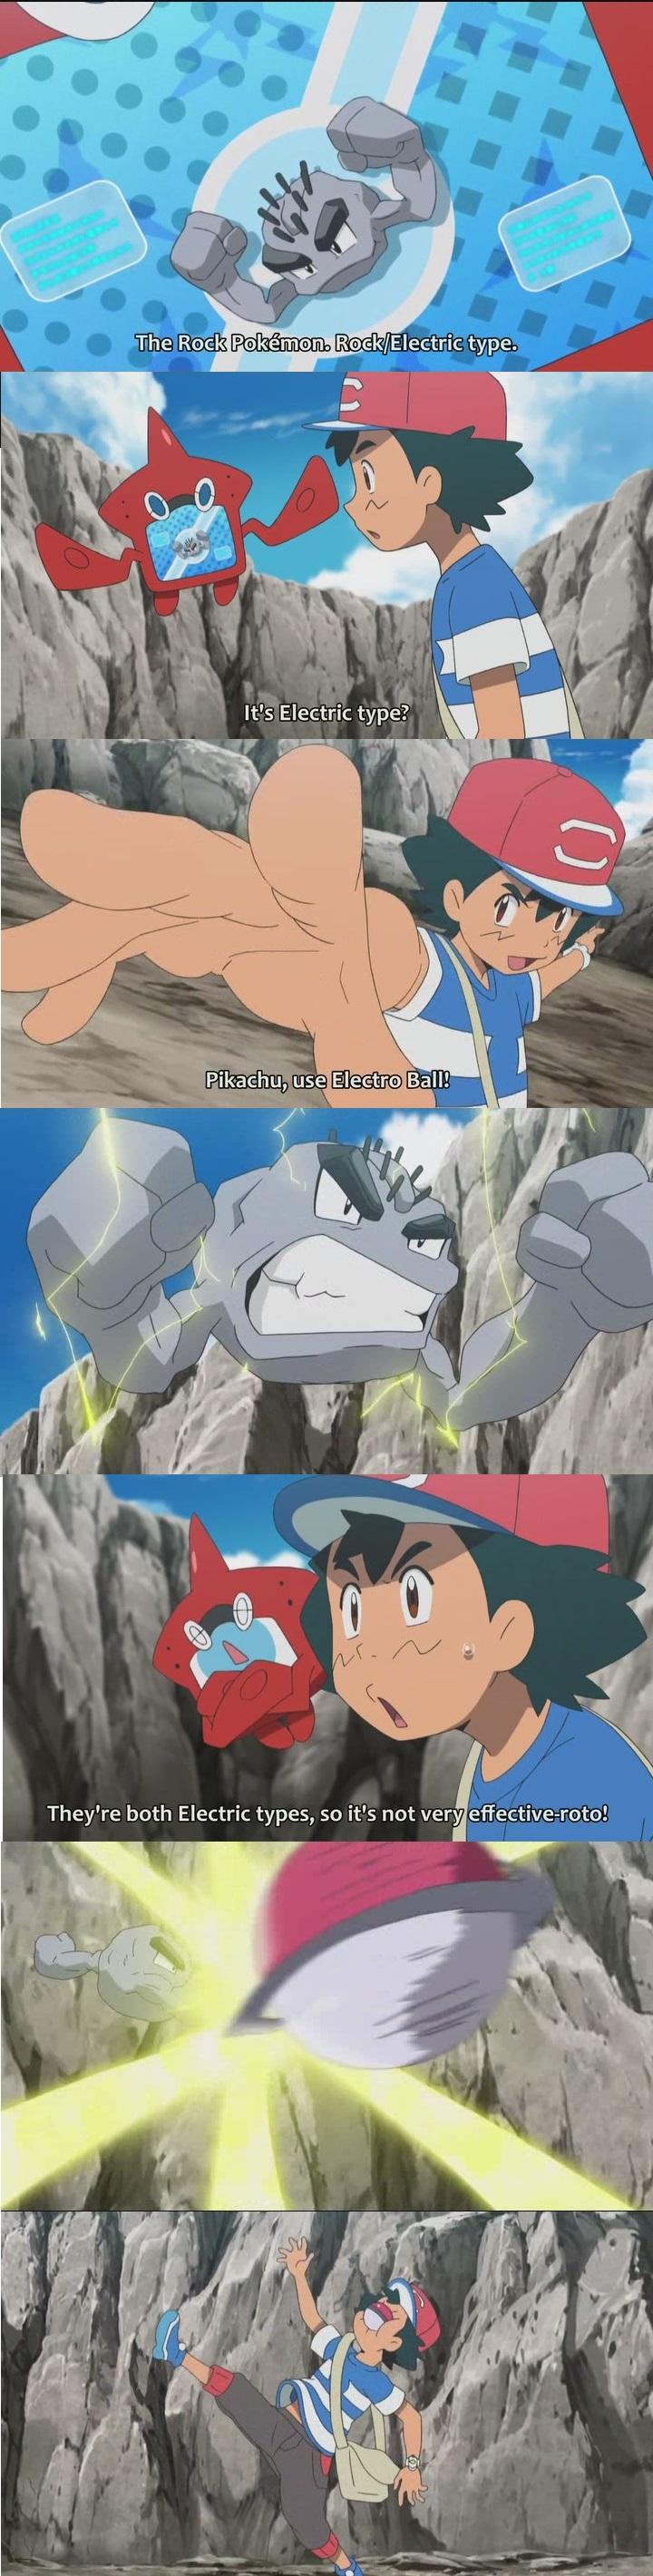 watch_pokemon_sun_moon_episode_32_english_subbedat_gogoani_0001.jpg